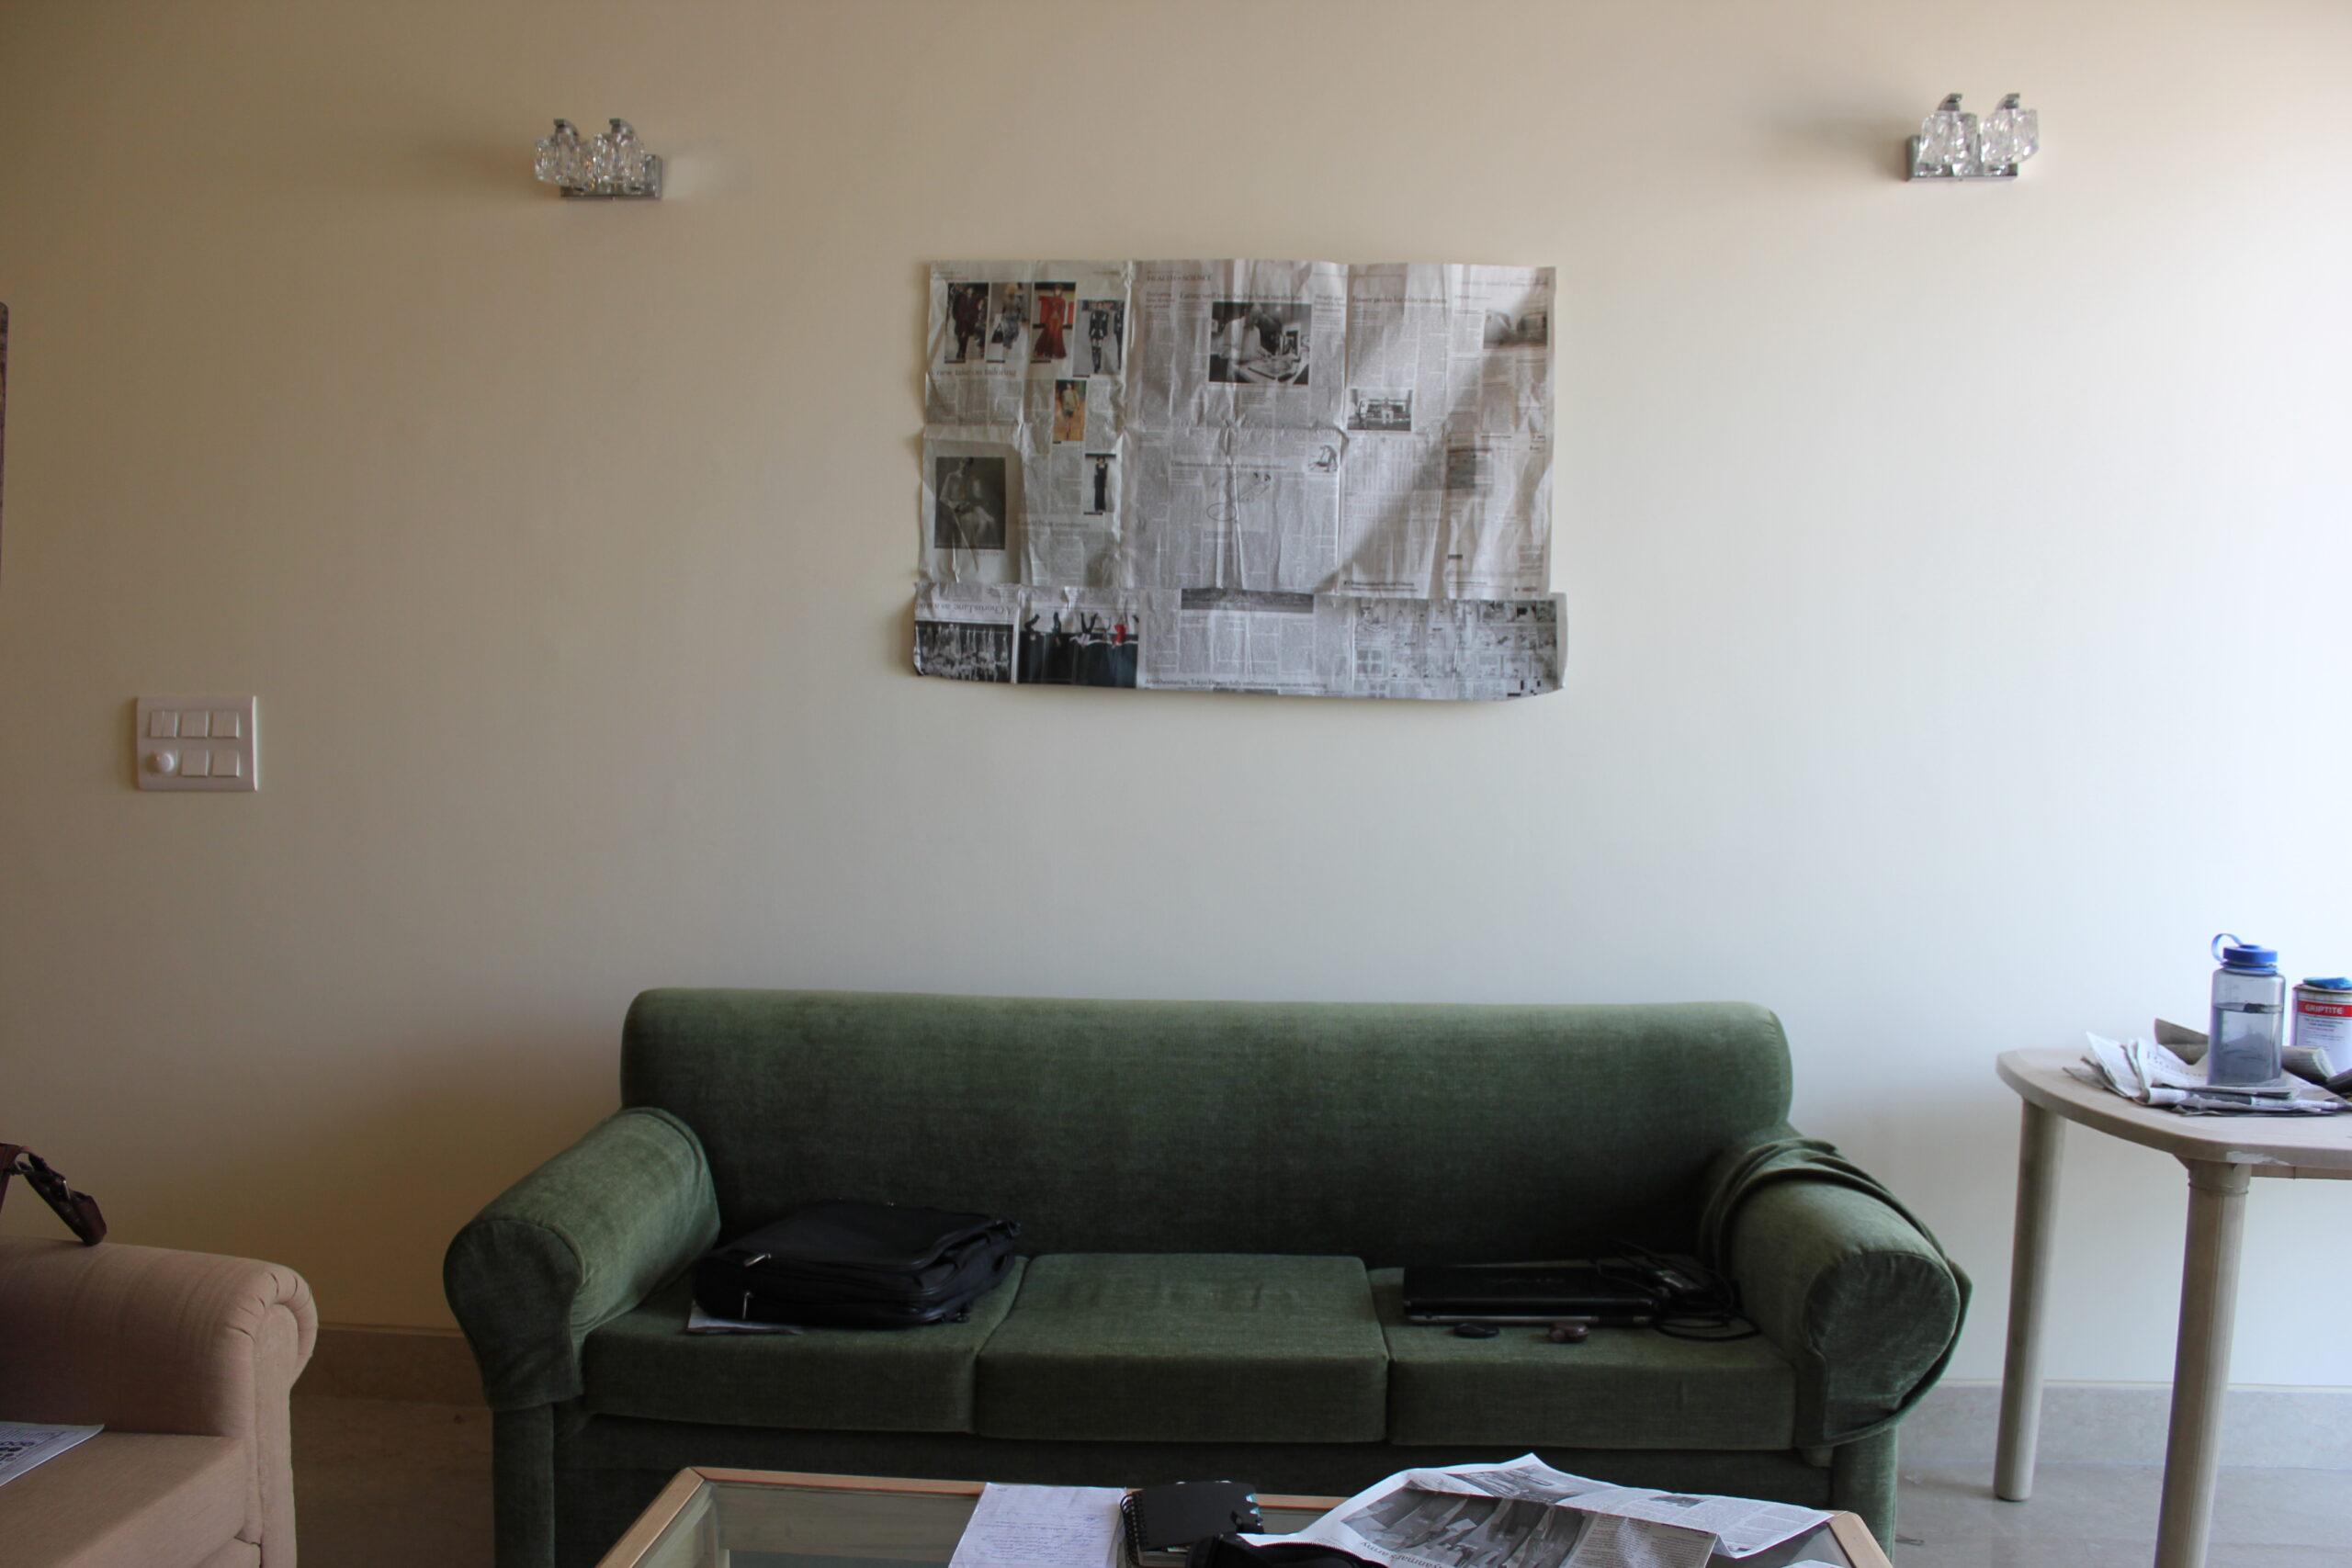 green sofa, delhi, interior deign, natural interiors, shivani dogra, art placements, wall, botanical prints, yellow and green, indoor plants